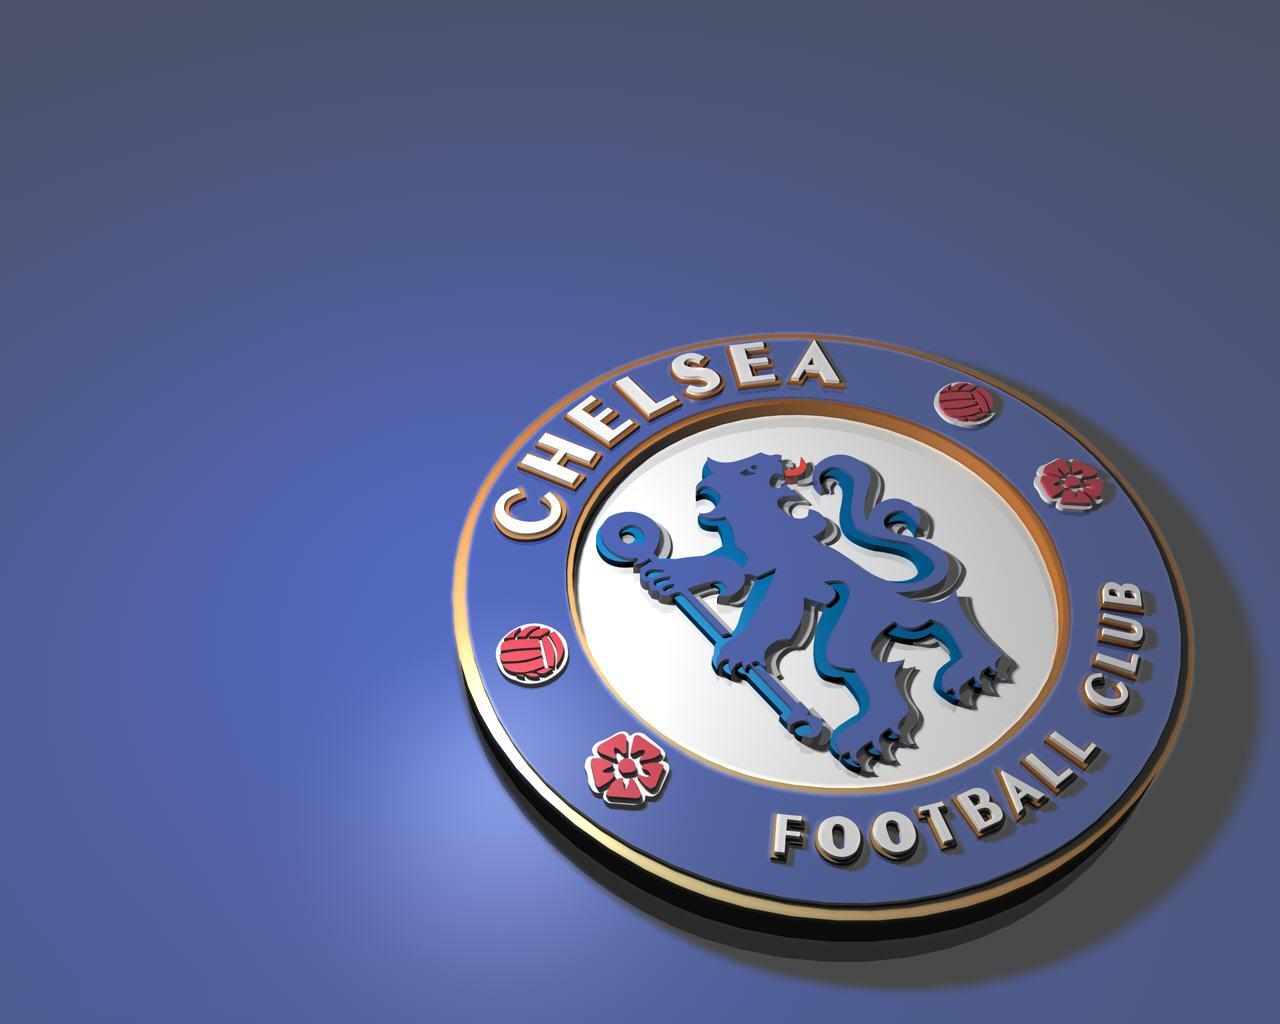 Chelsea FC Logo Hd Wallpapers 1280x1024